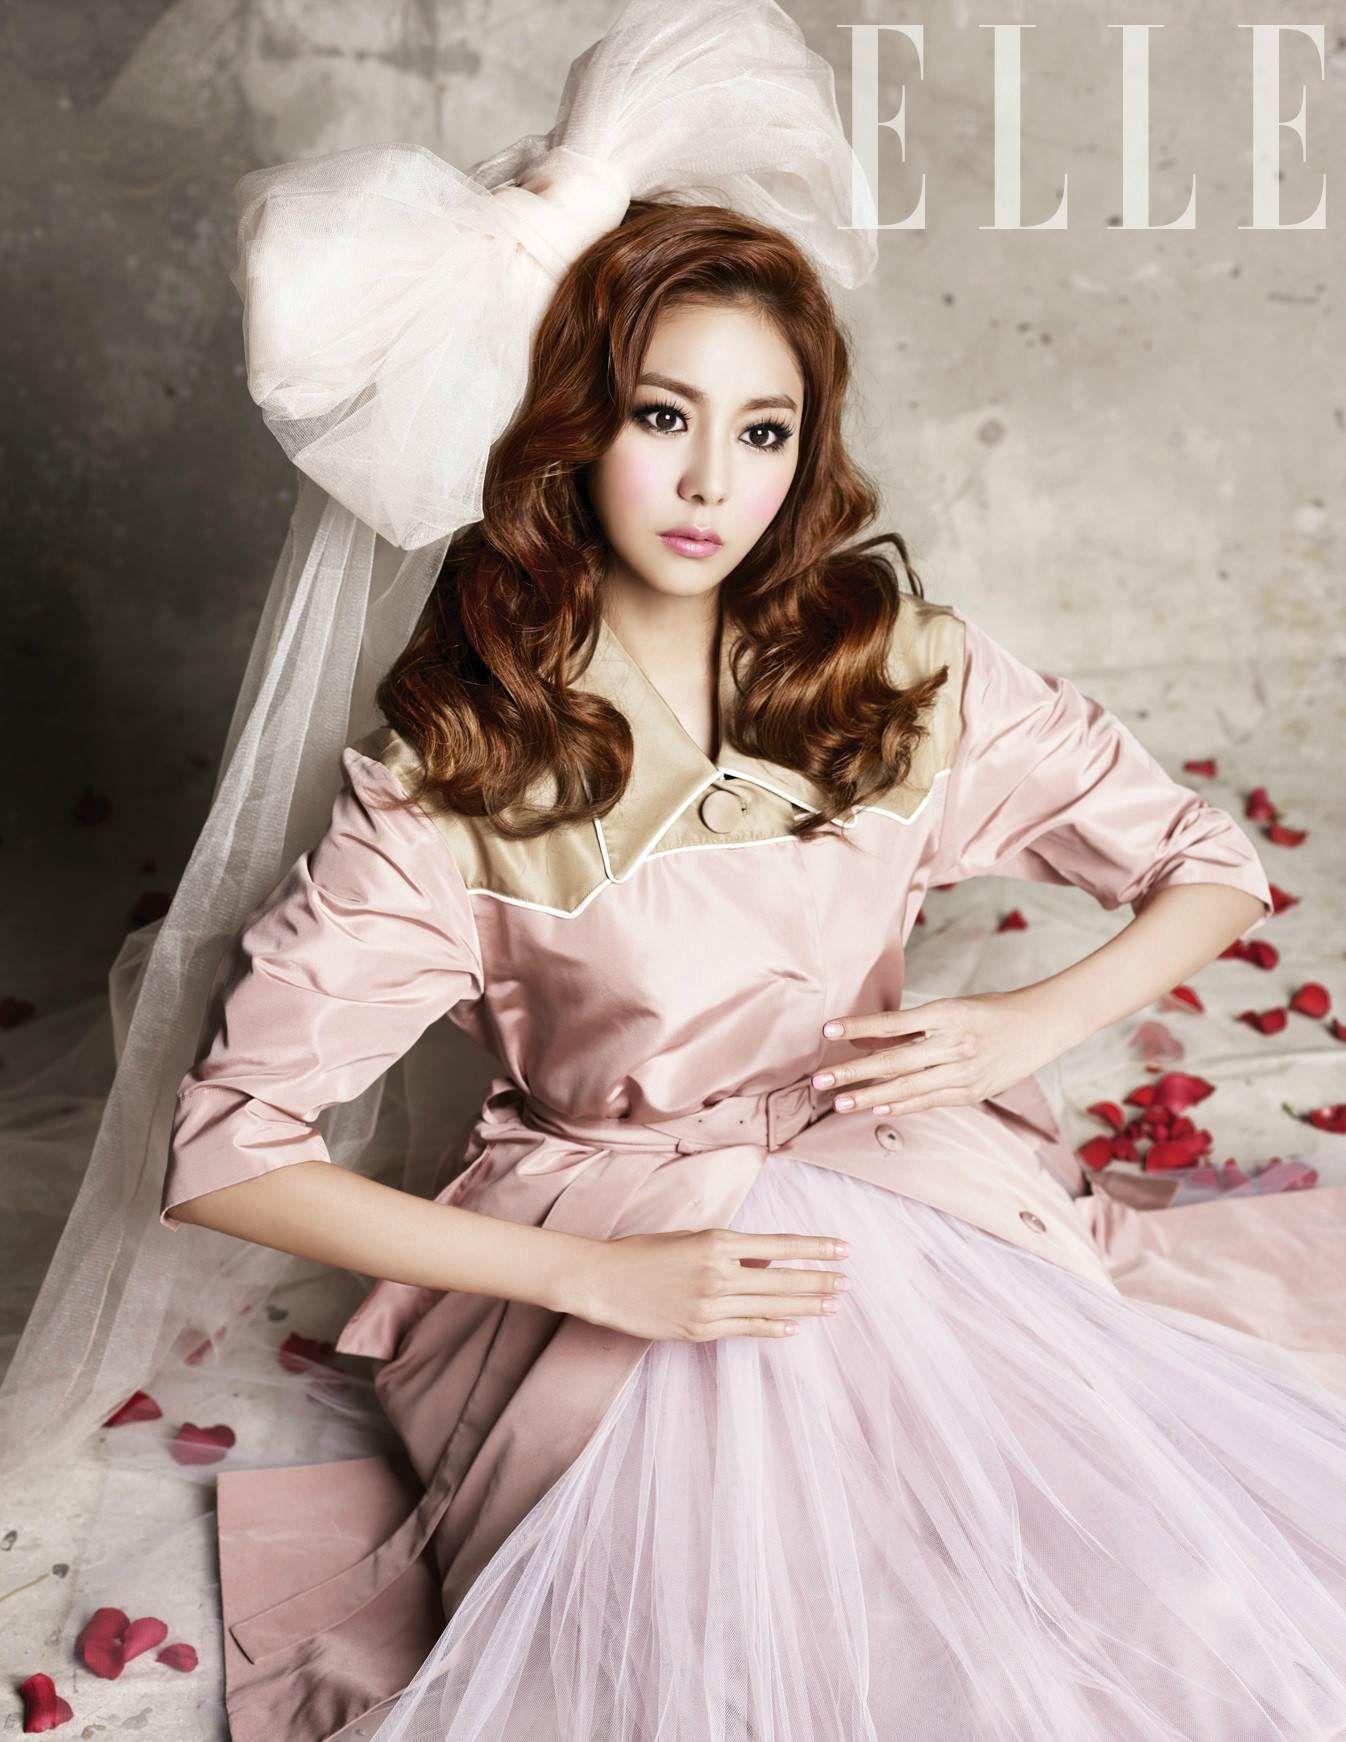 Photos K Pop Idols And K Drama Stars Who Look Like Dolls Kpop Fashion Fashion Korean Fashion Trends